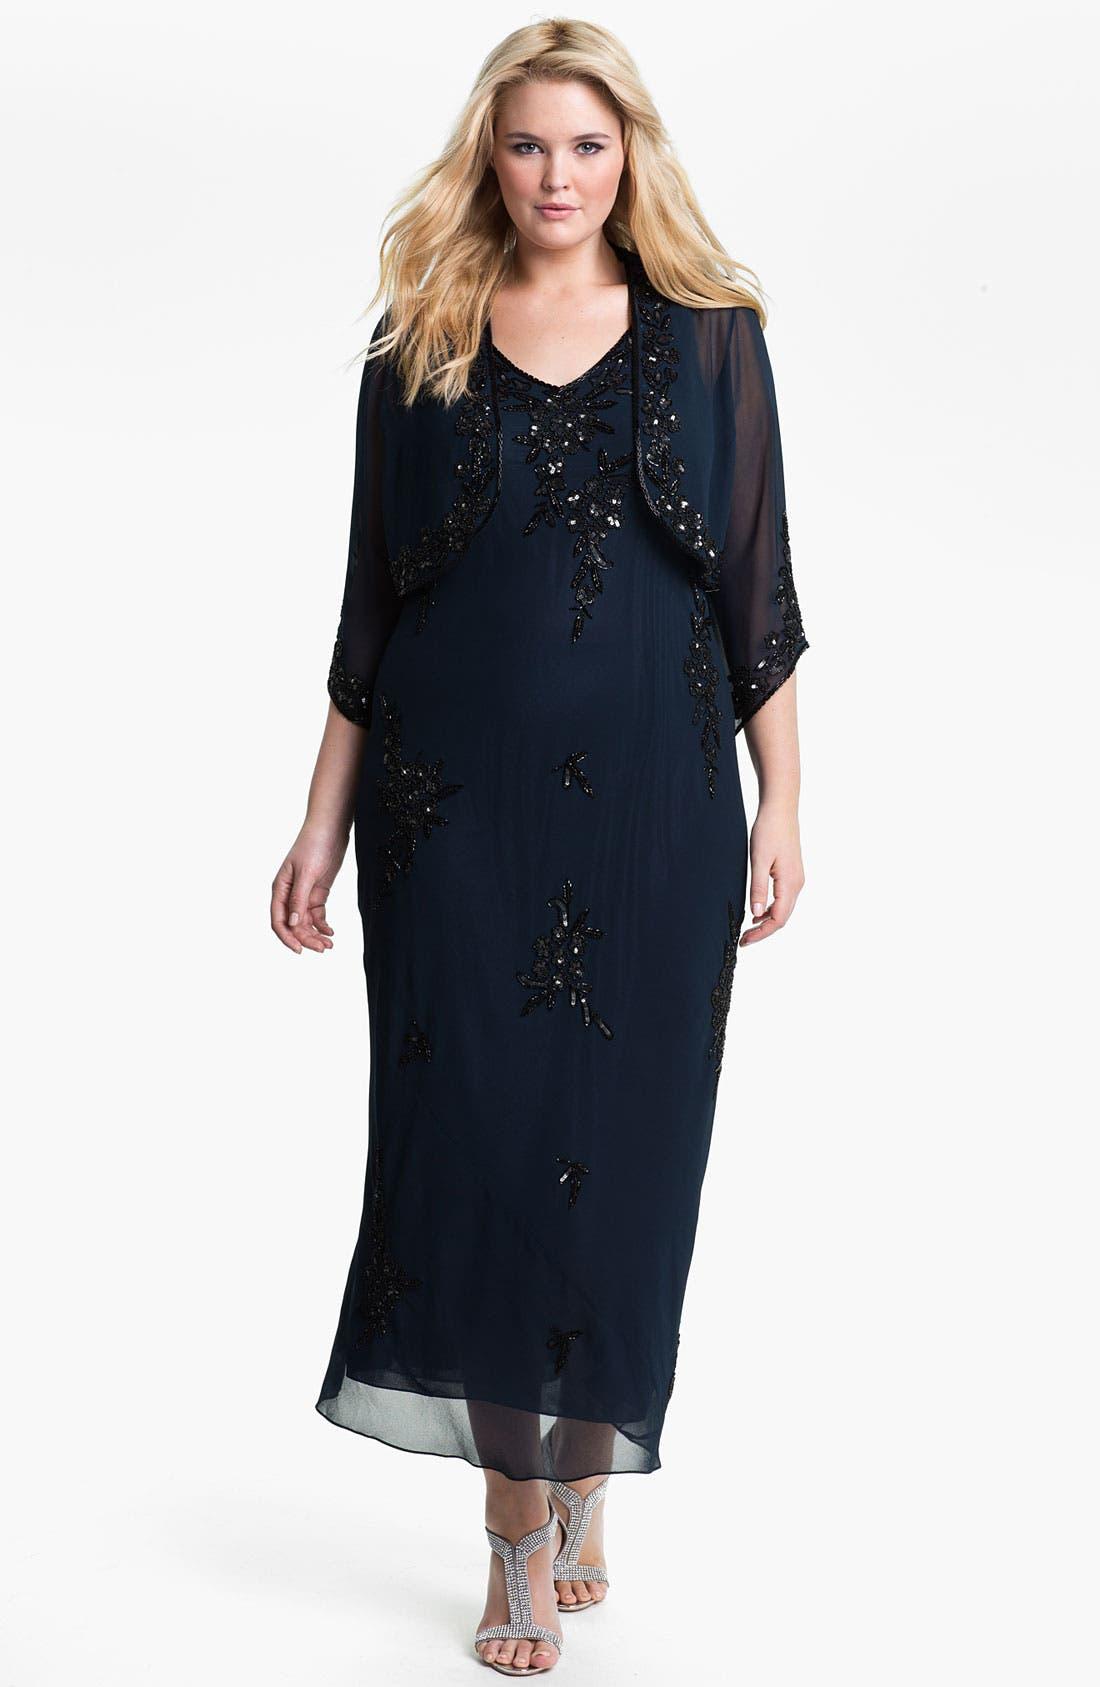 Alternate Image 1 Selected - J Kara Beaded Chiffon Dress & Jacket